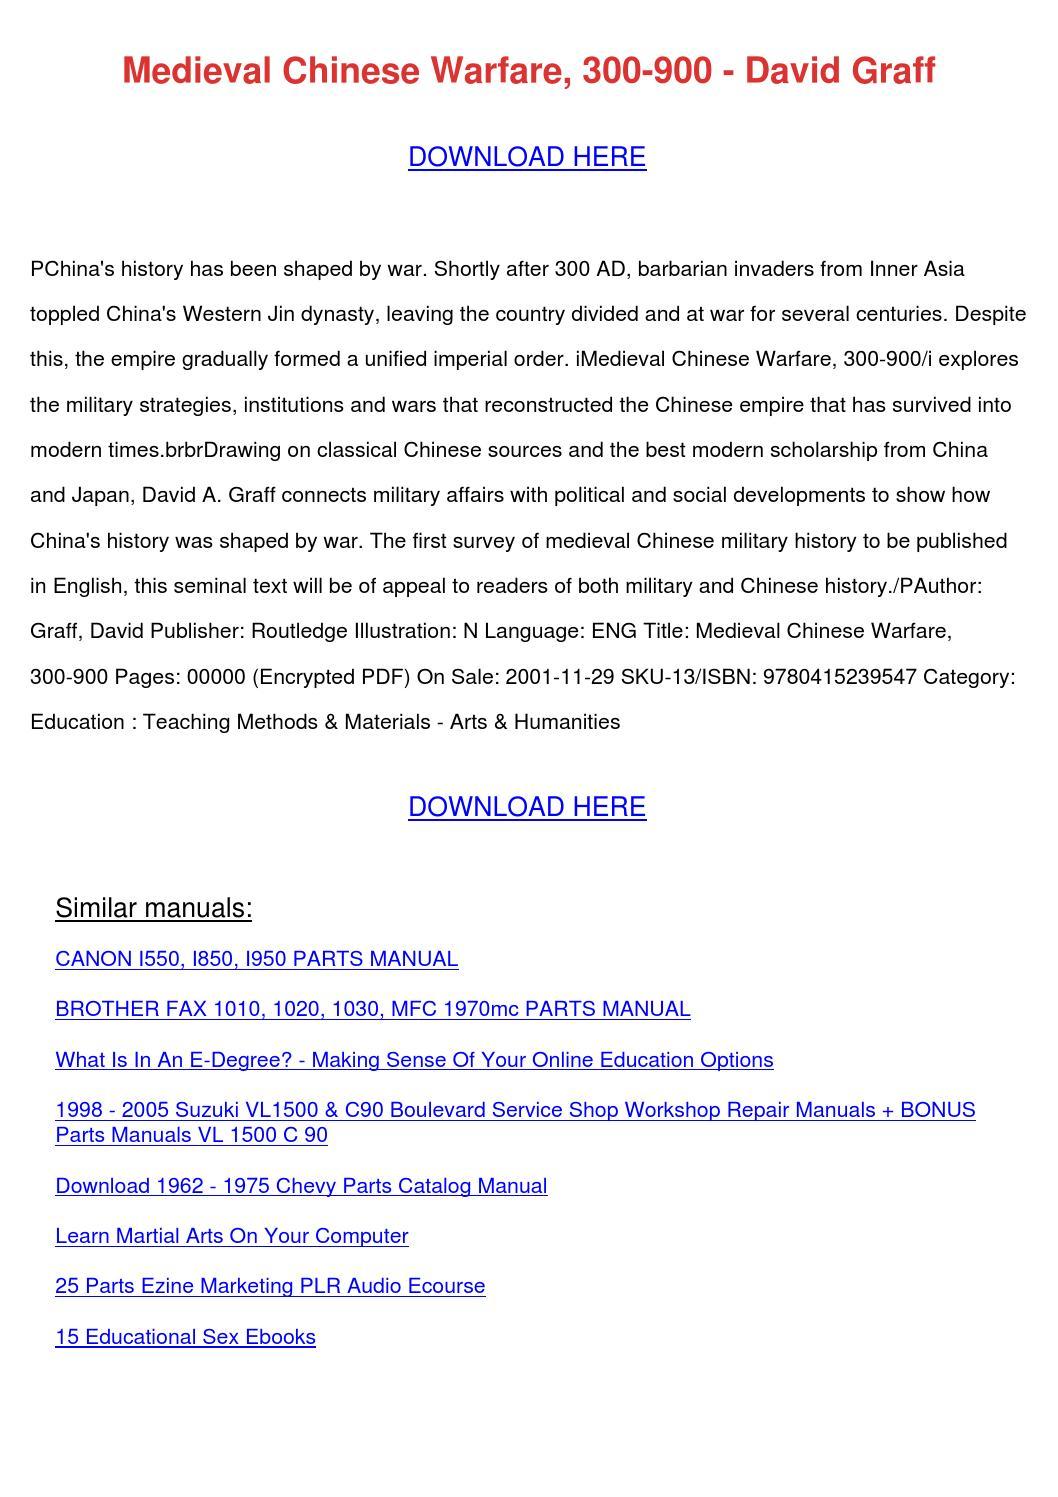 Medieval chinese warfare 300 900 david graff by preciouspaulson issuu fandeluxe Images